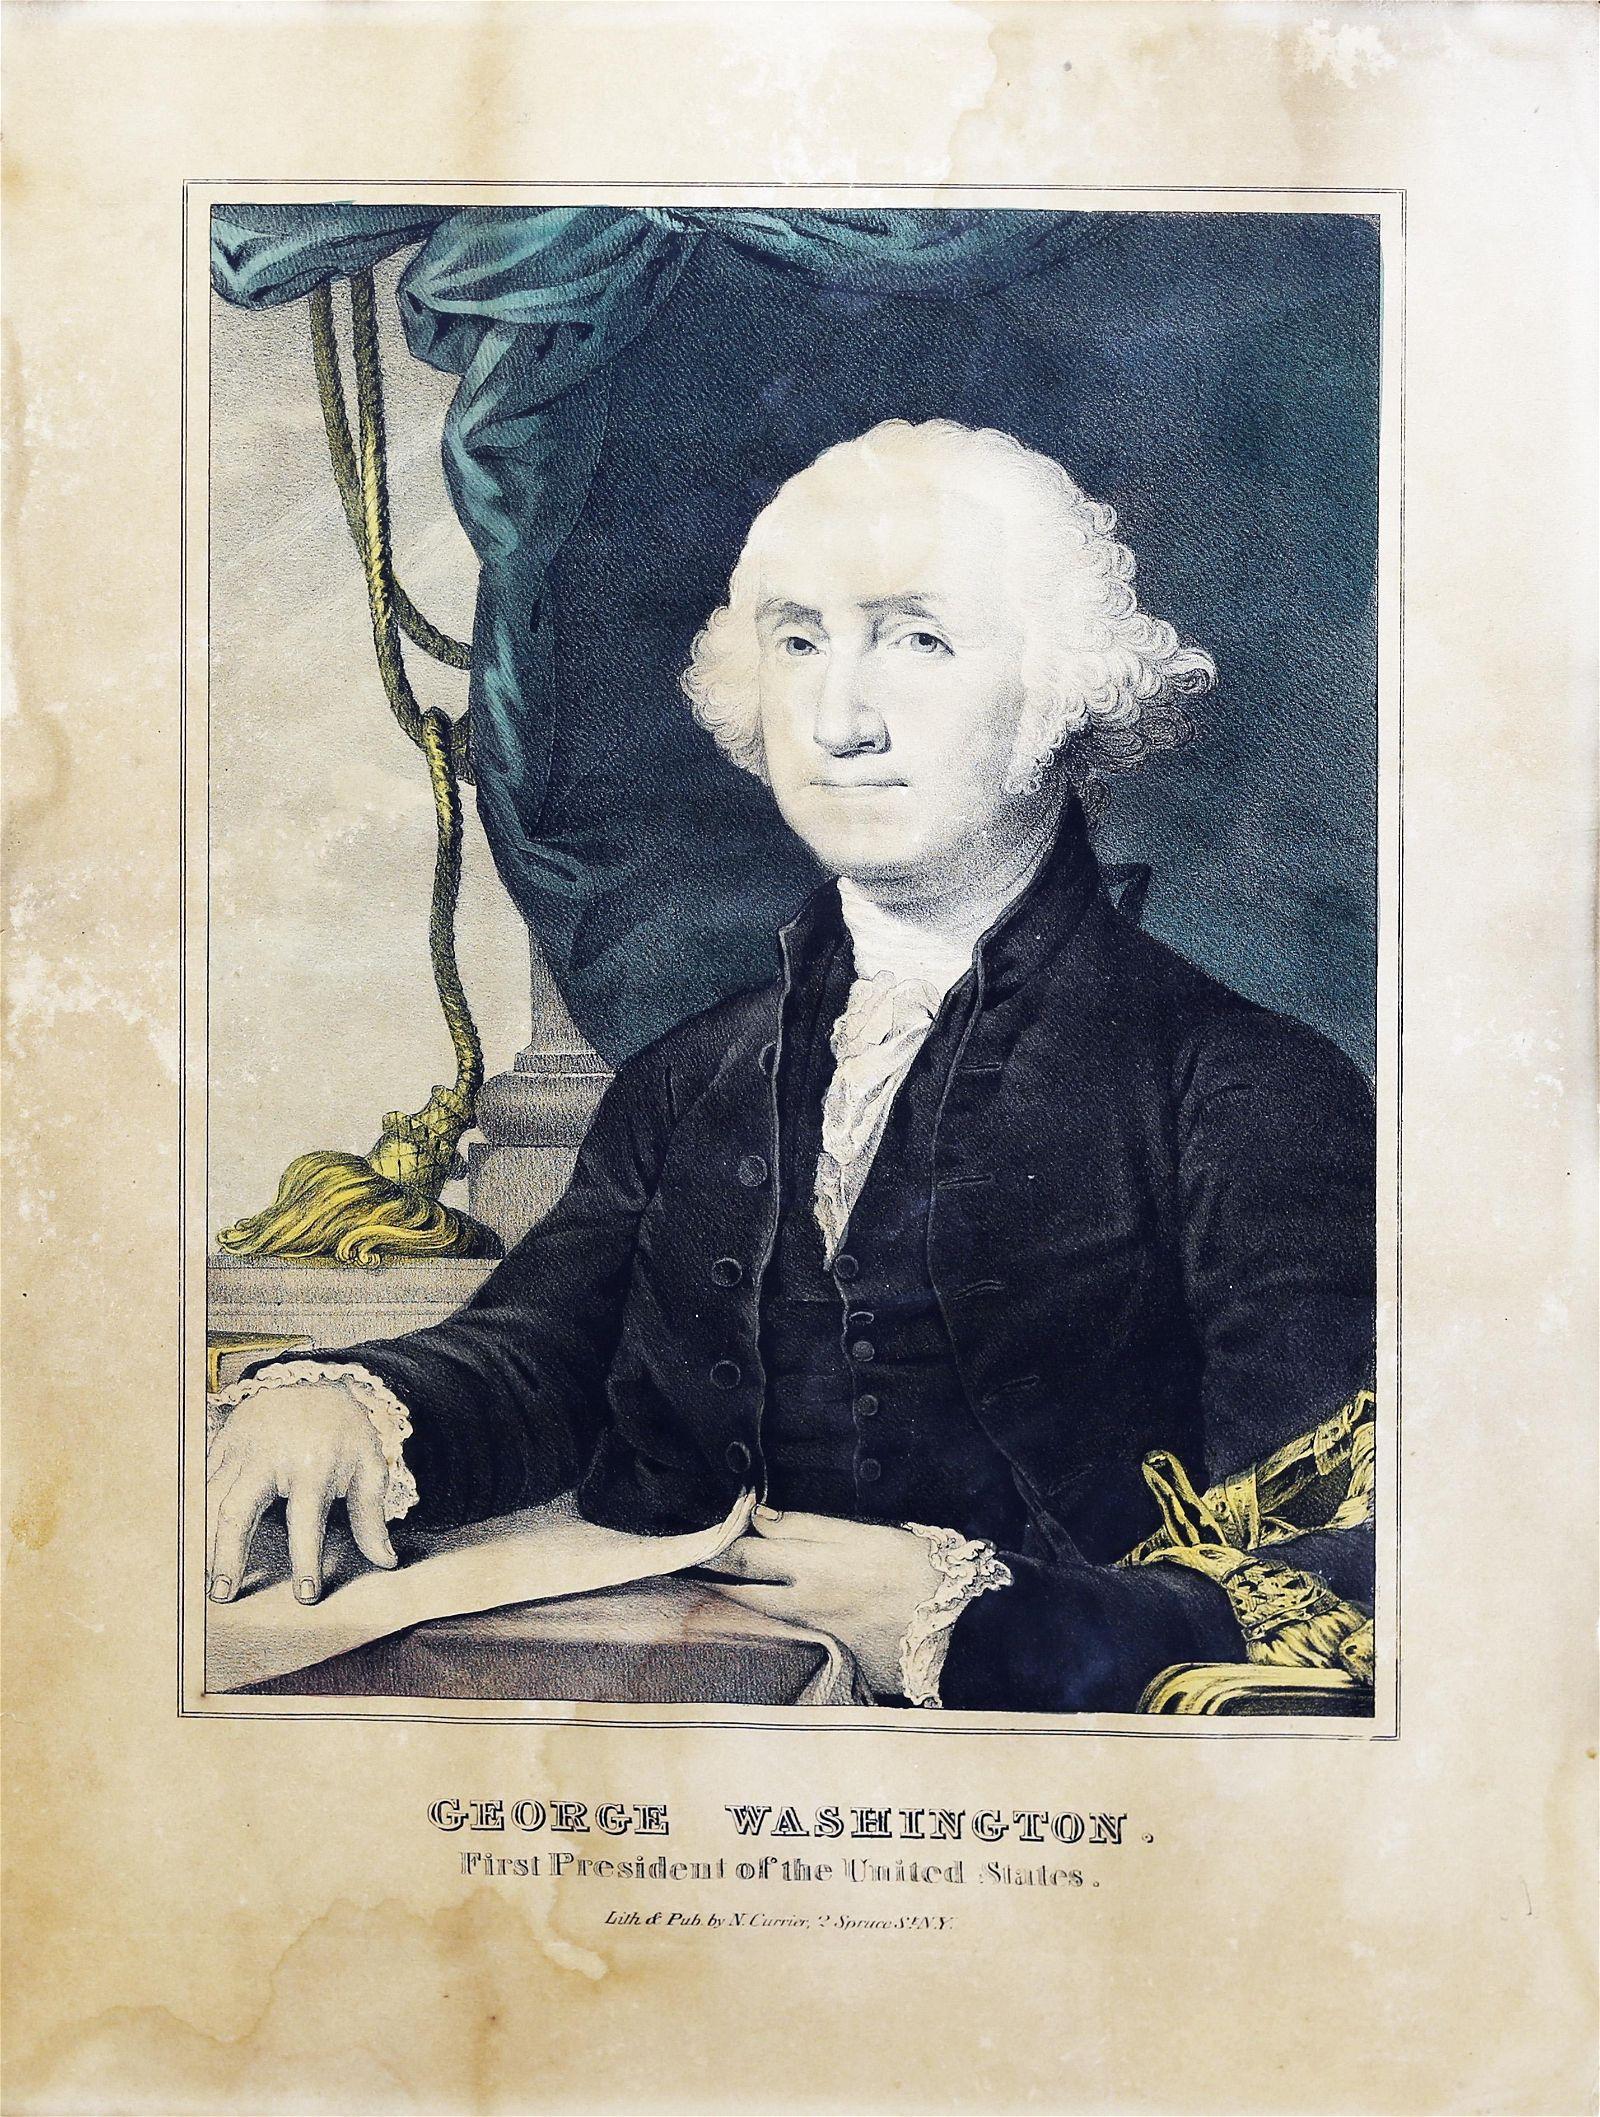 Currier, George Washington